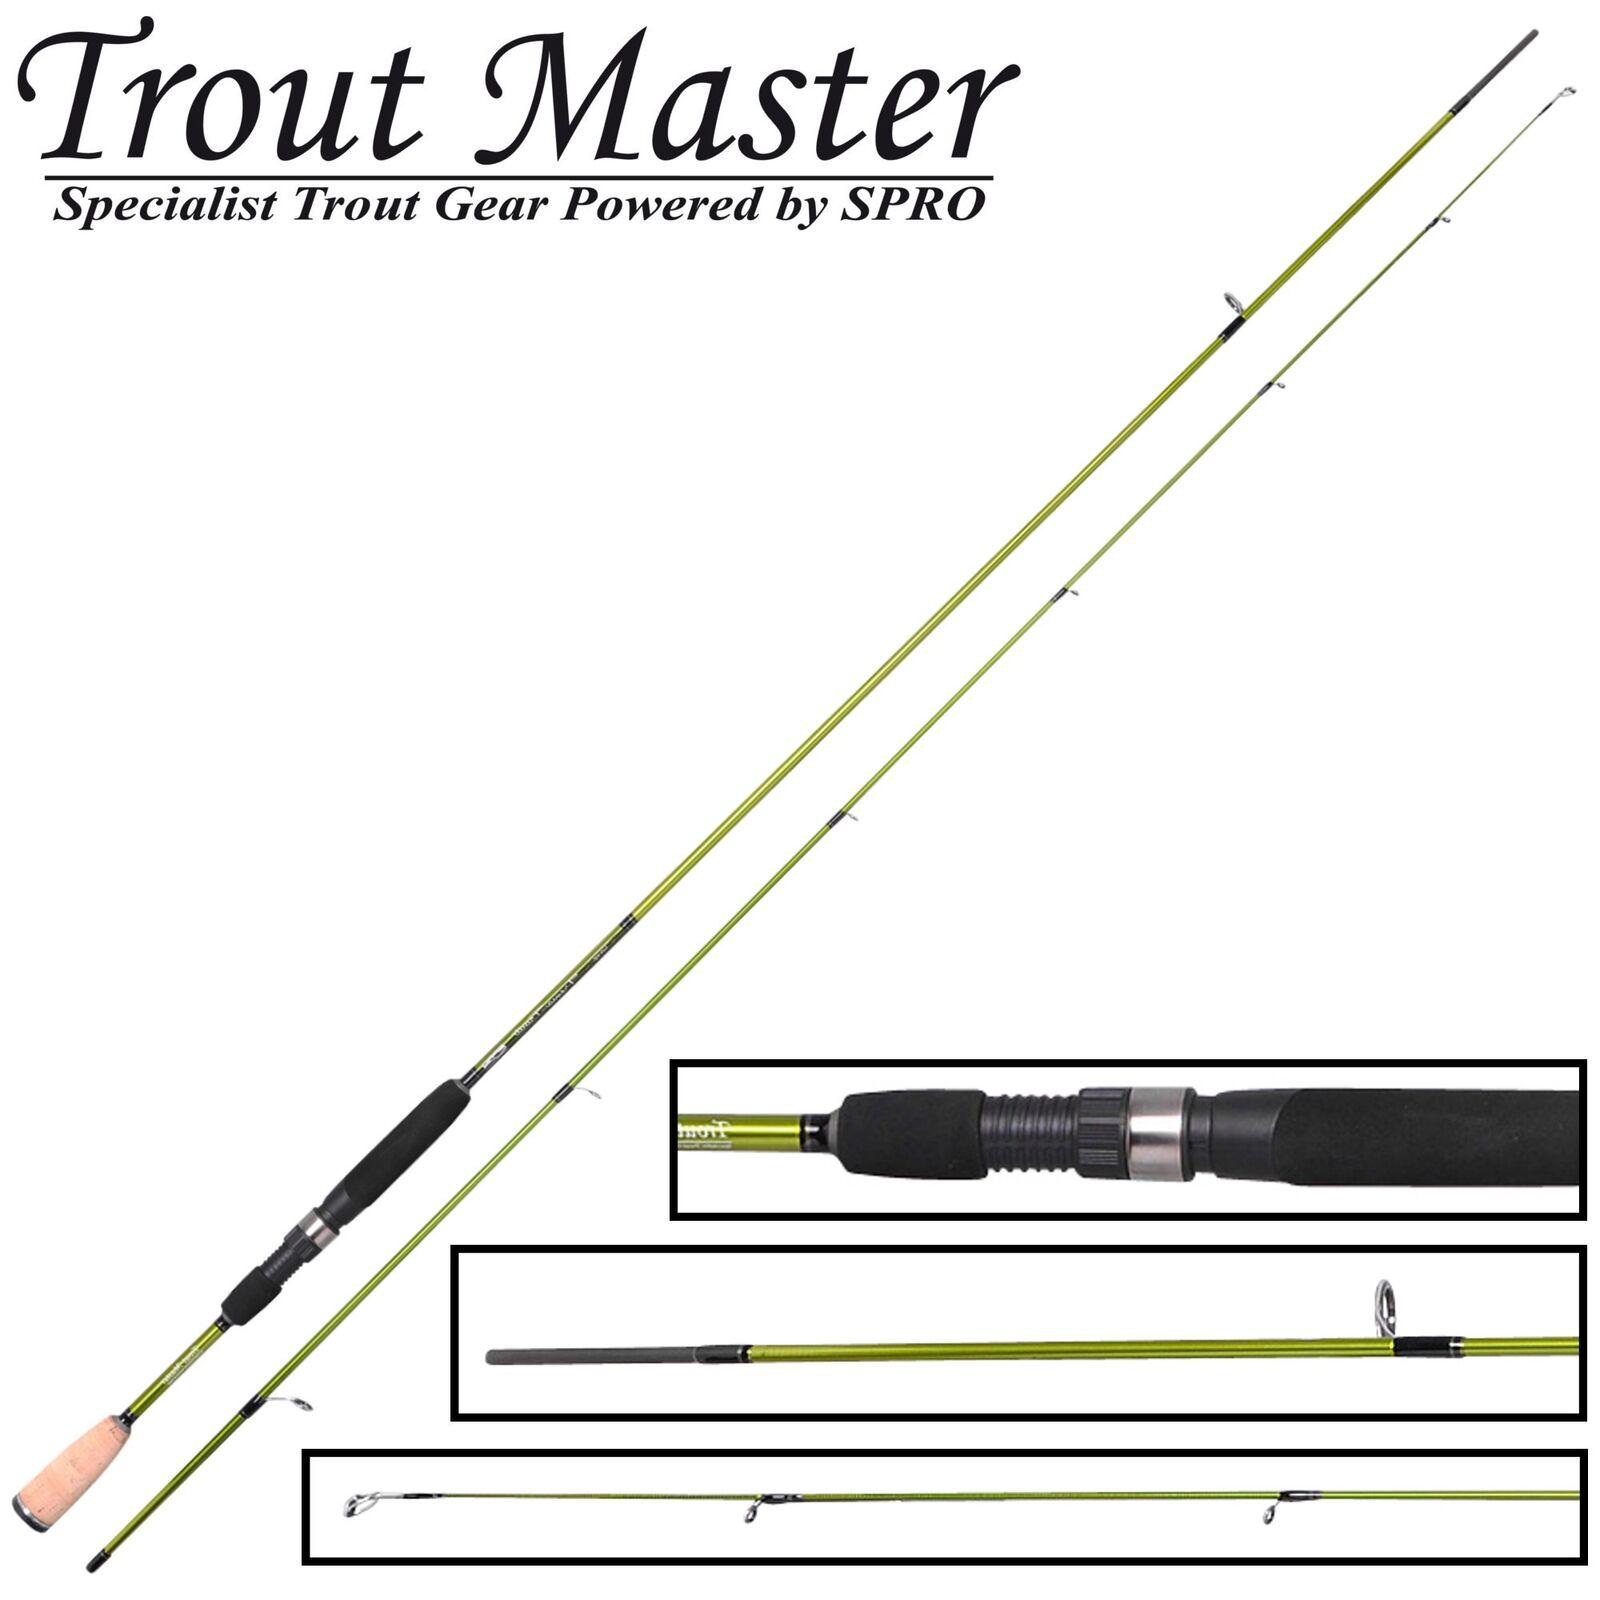 Trout Master Trema Trout UL 2,40m 2-8g - Forellenrute, Ultra Light Rute